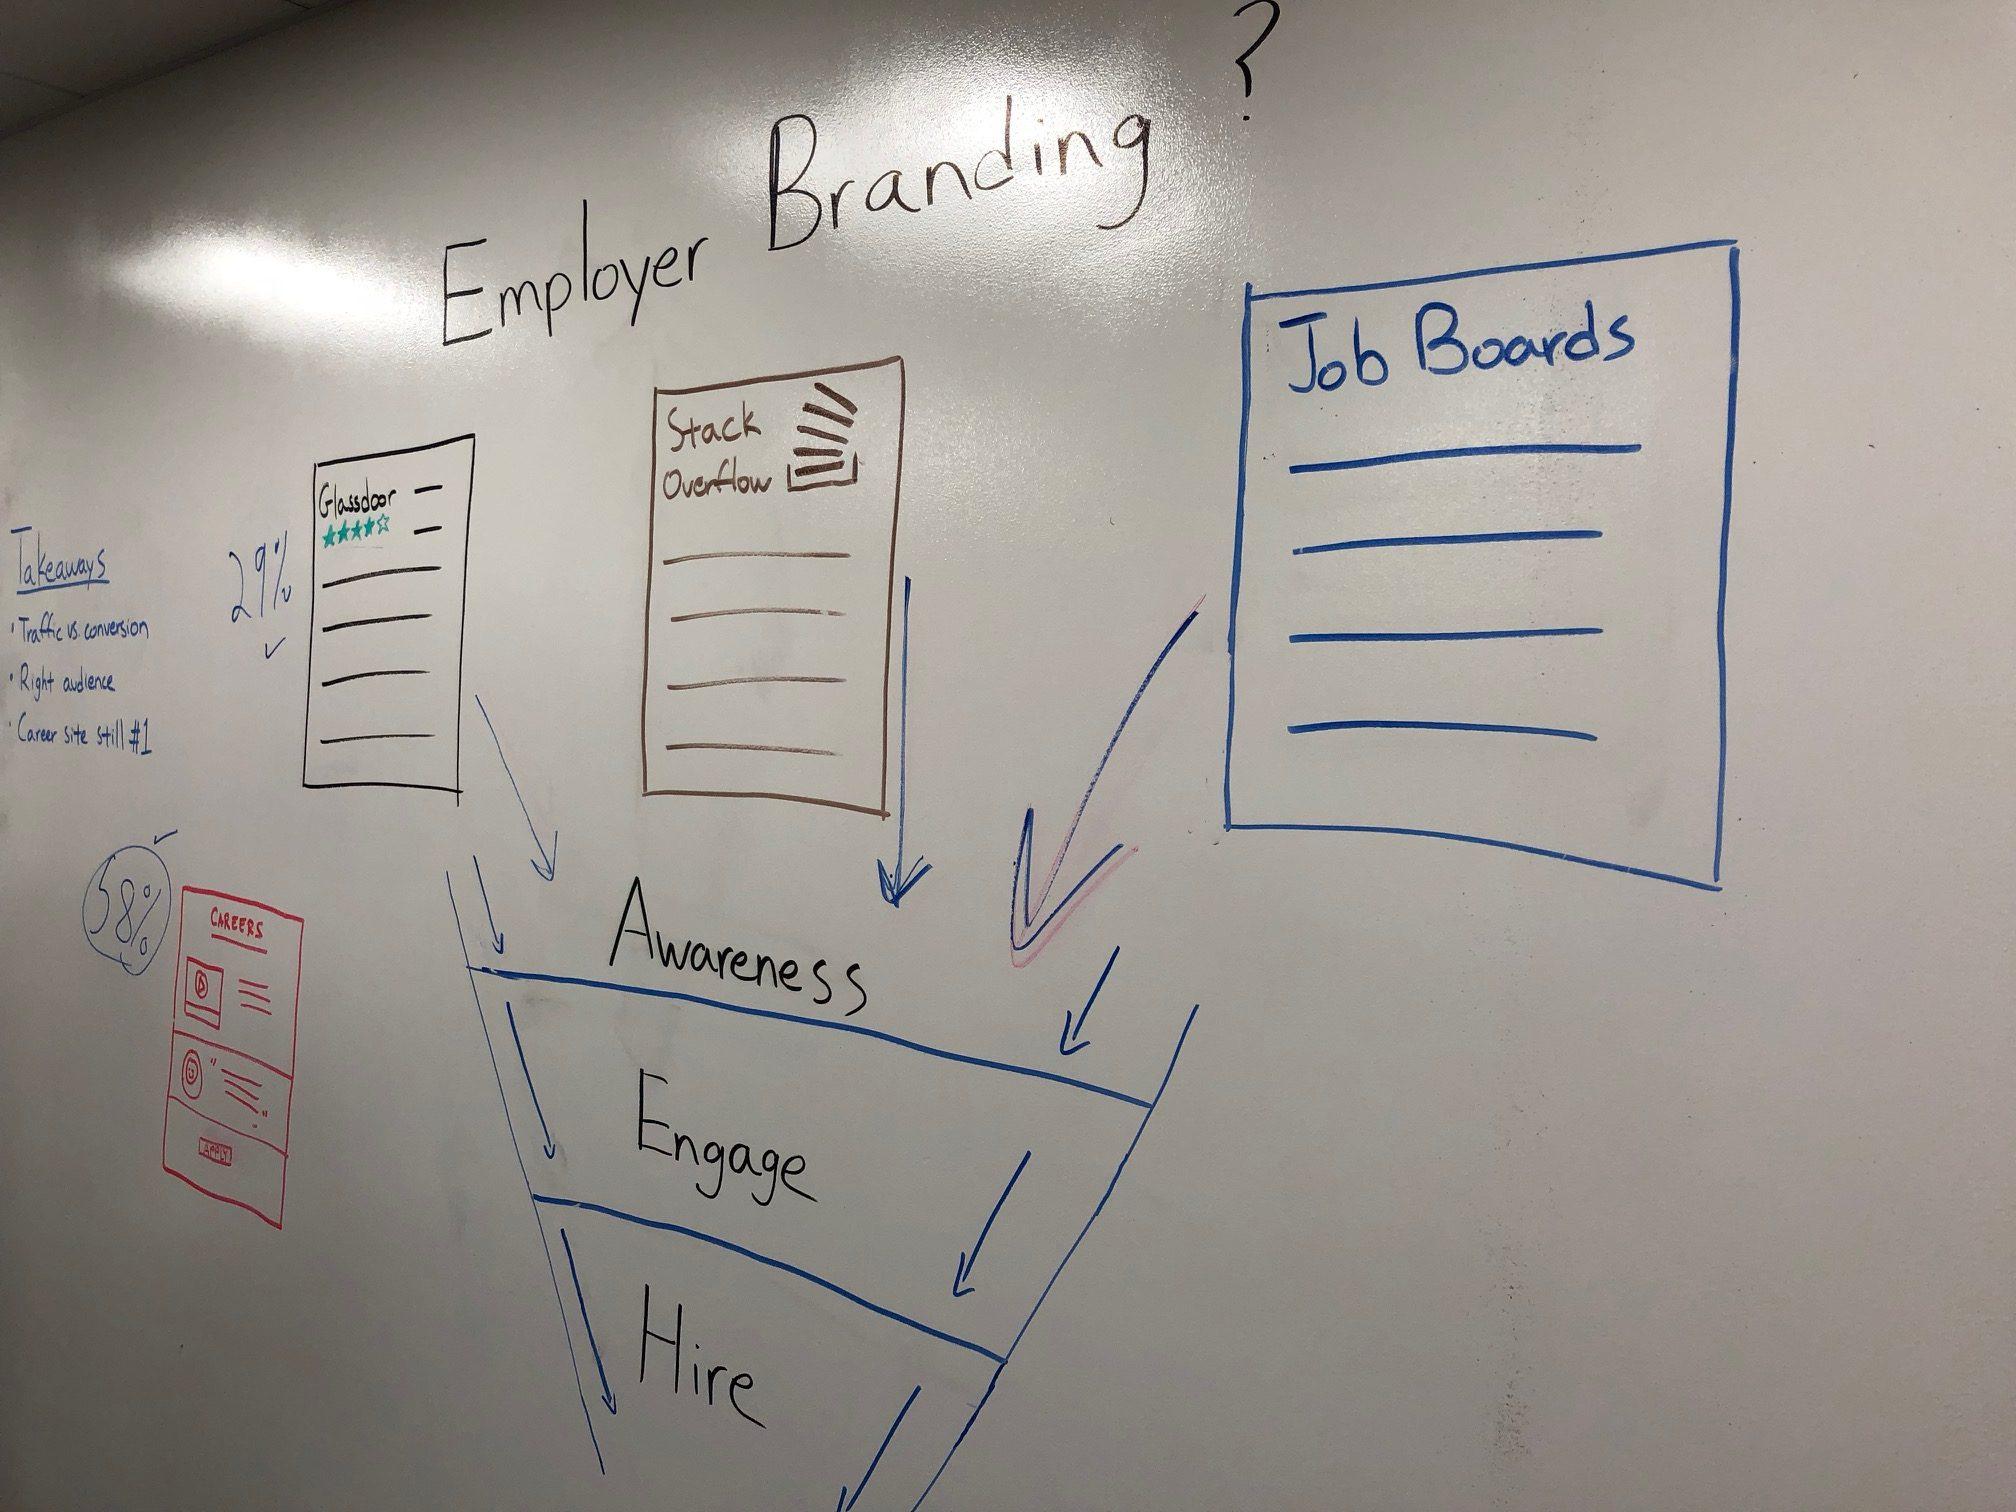 What Constitutes Employer Branding?